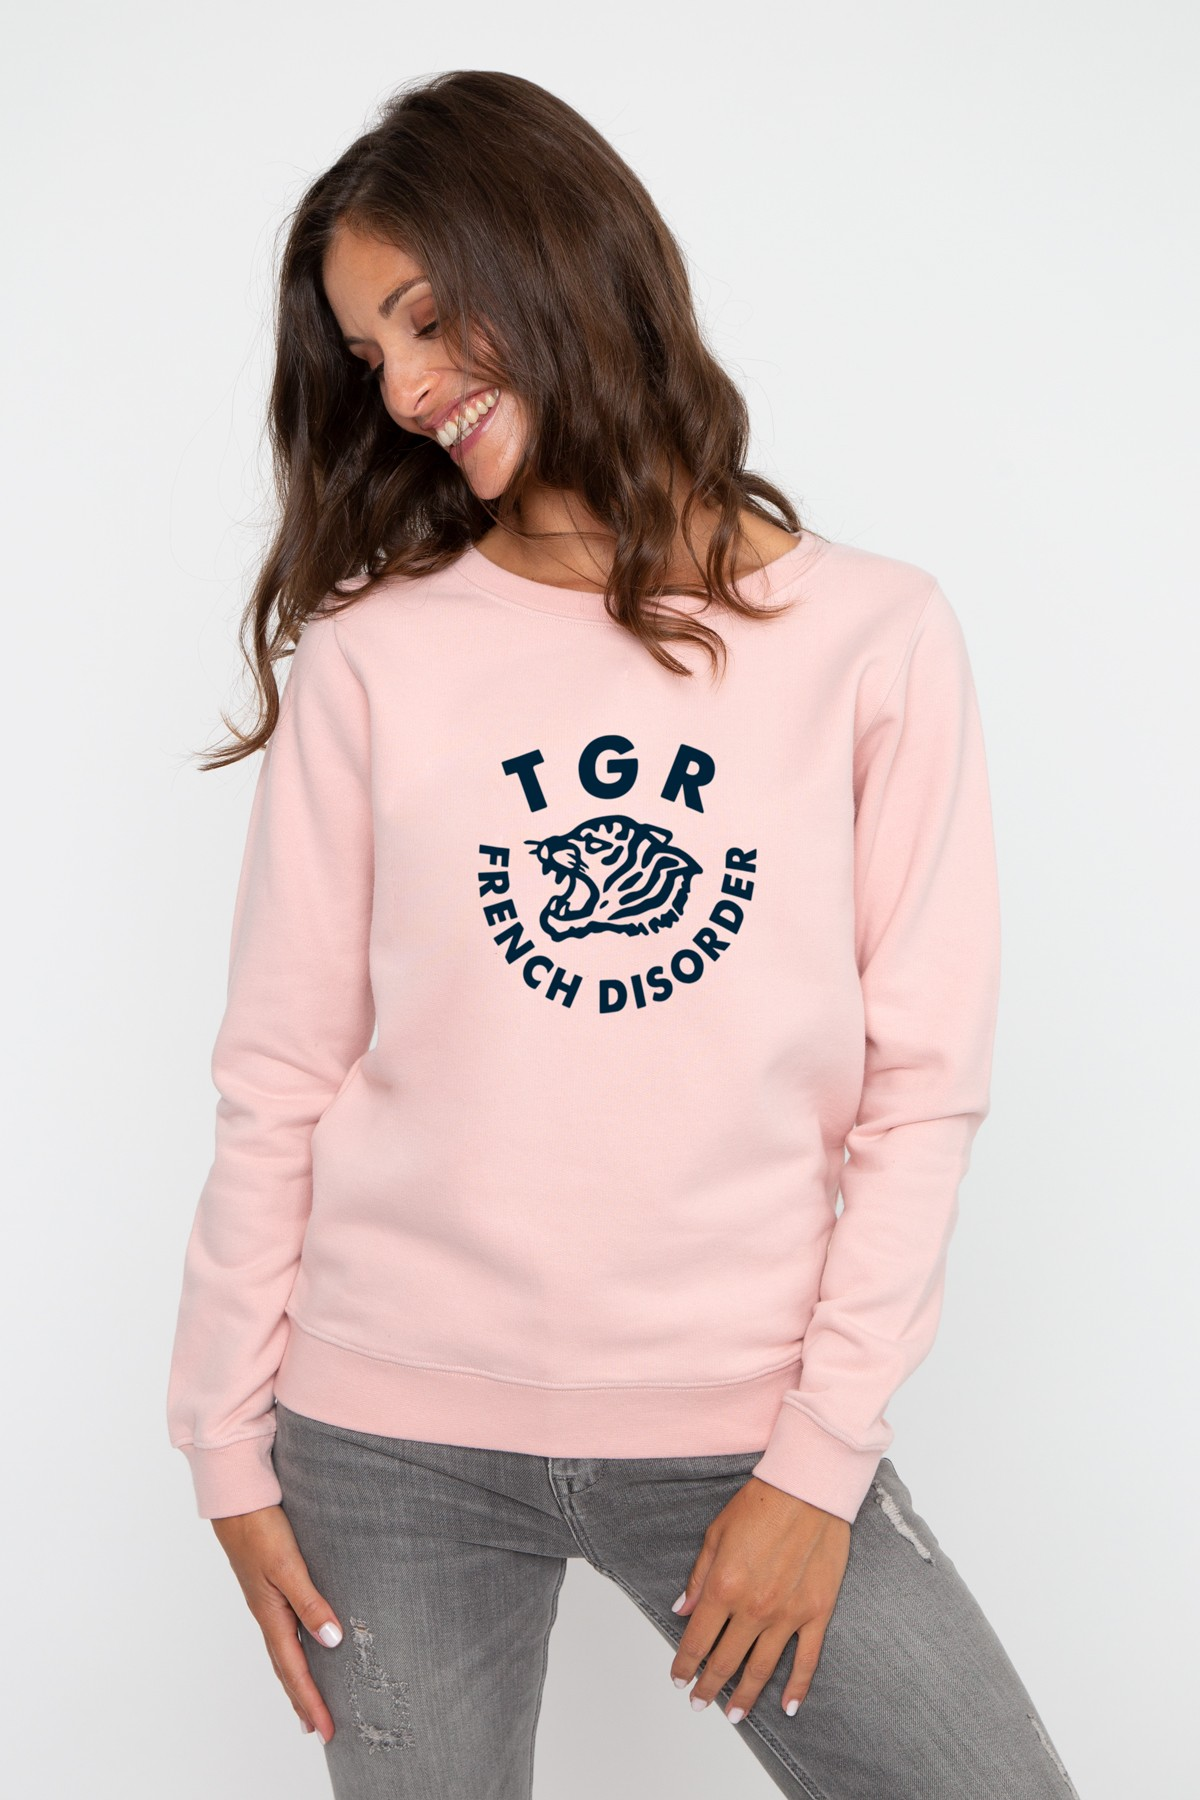 Casual Ultra-Comfy Sweatshirt